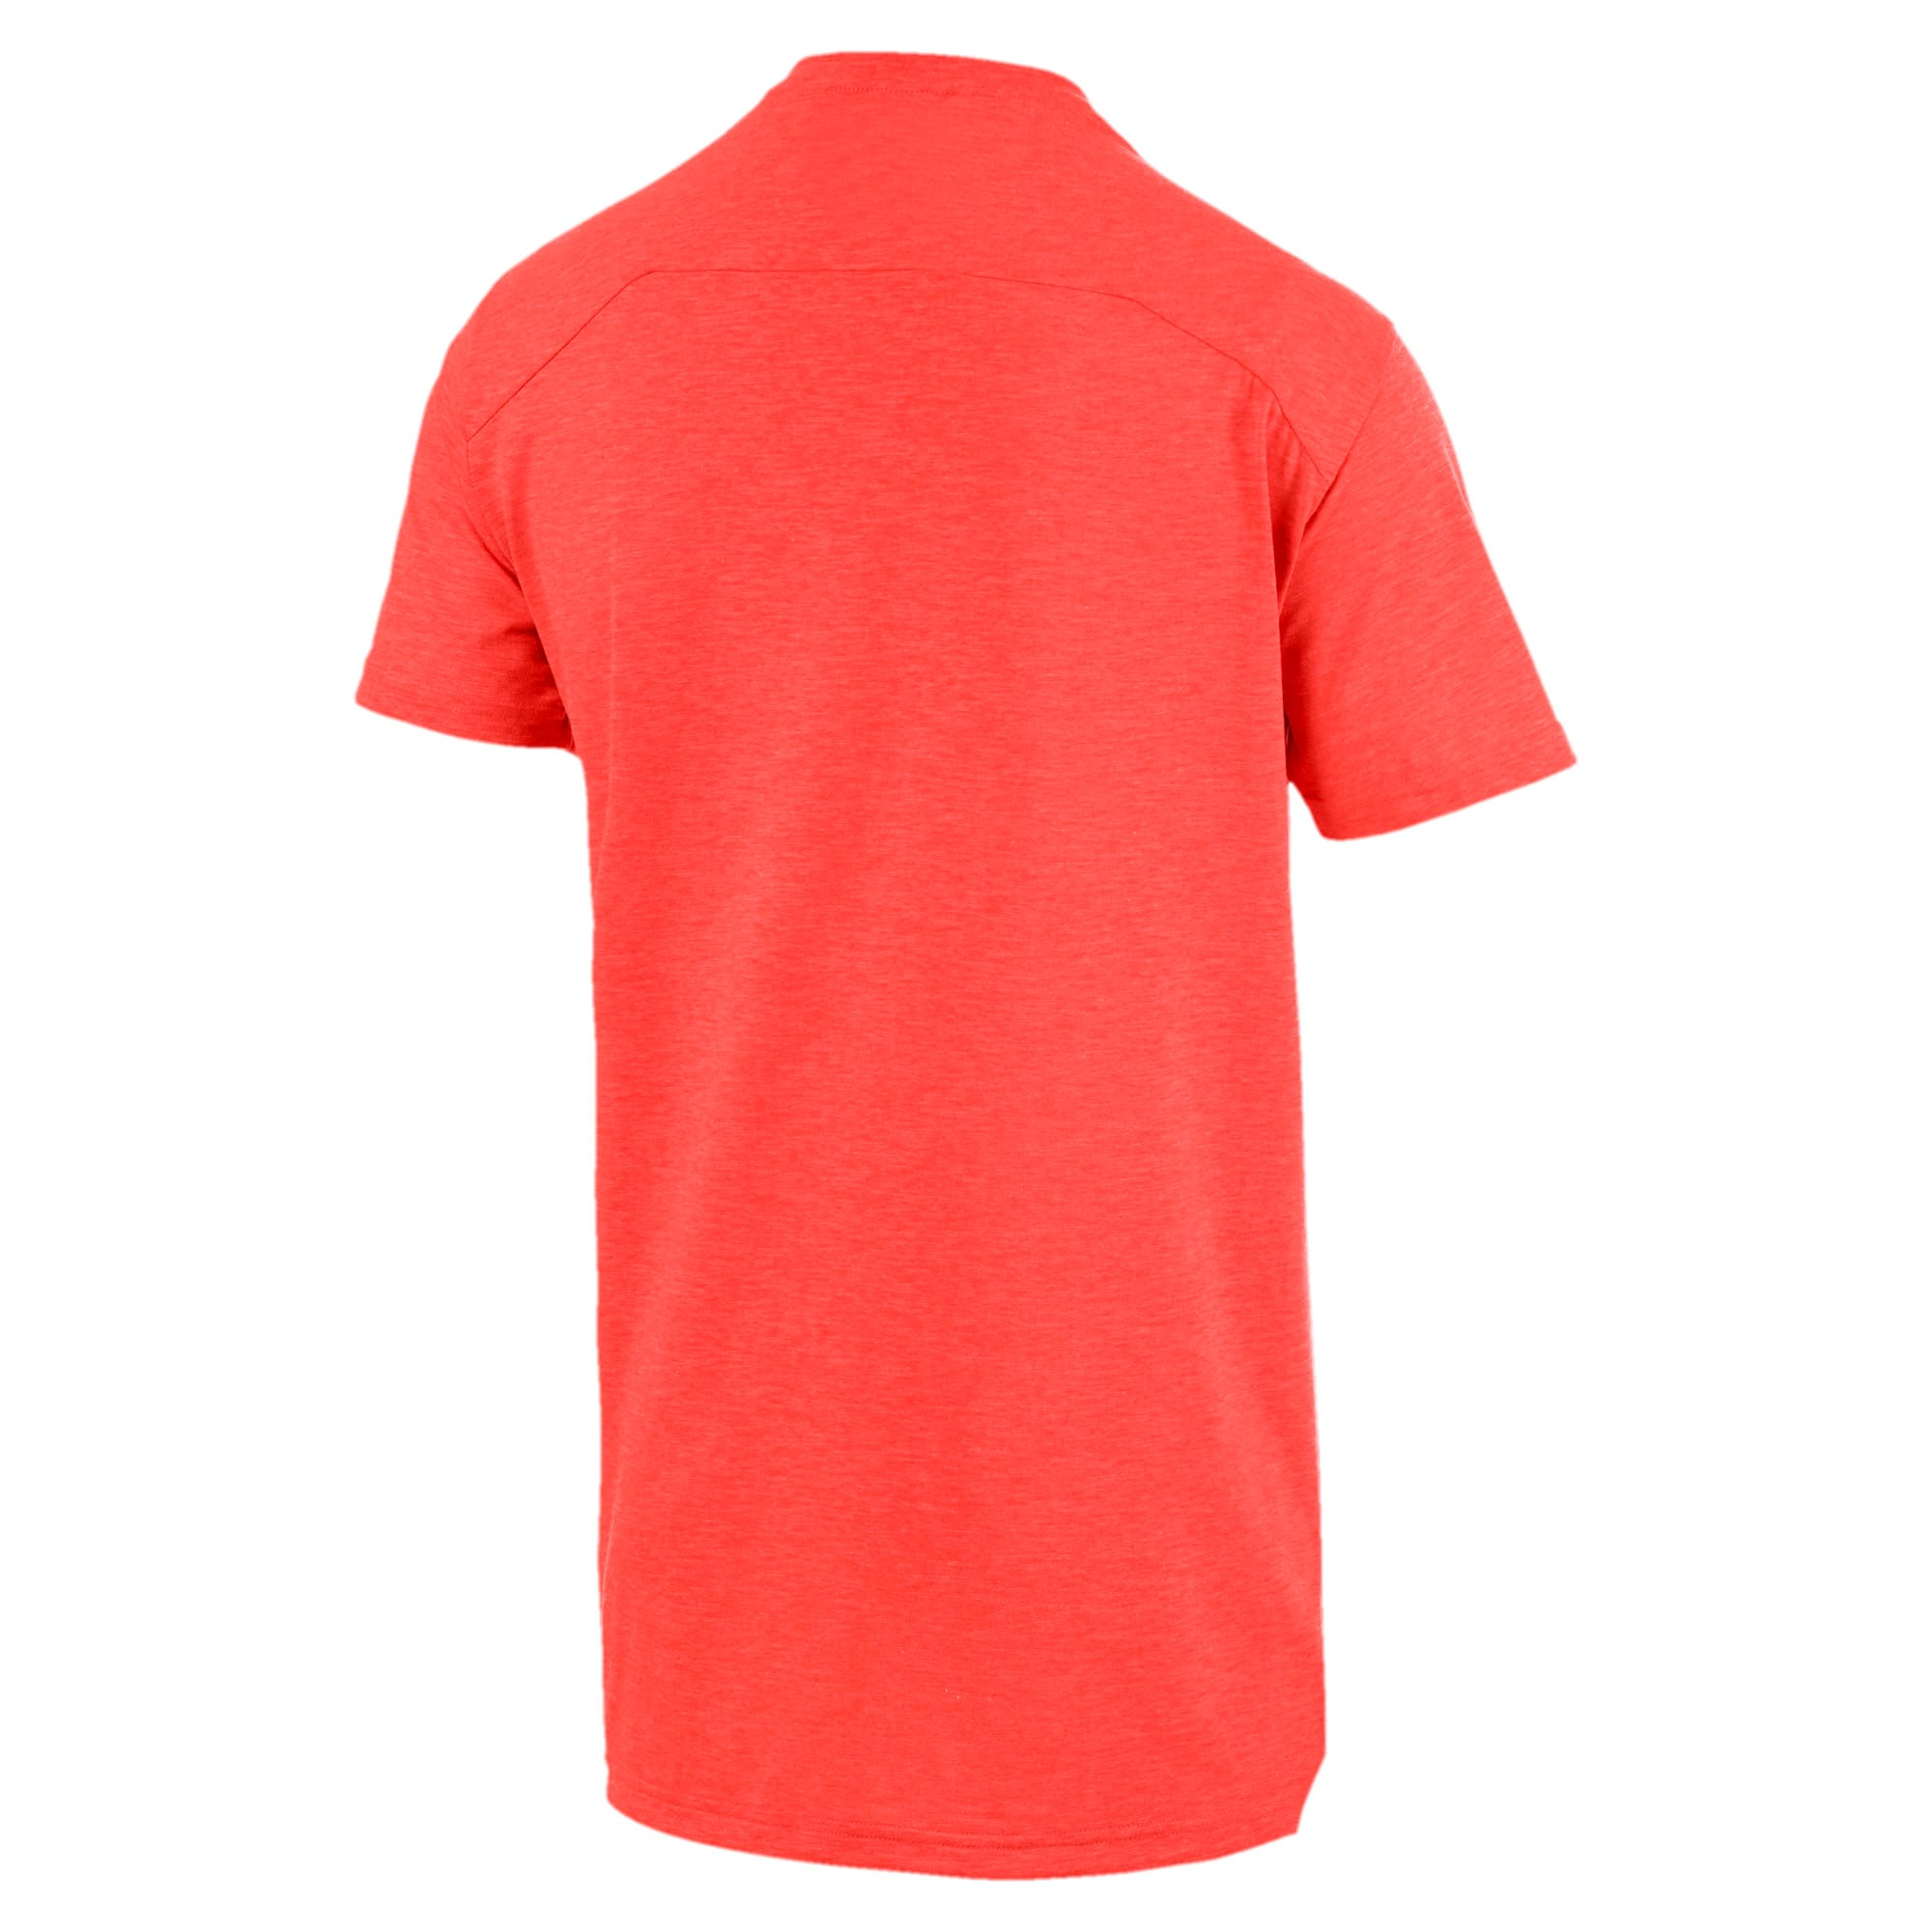 Thumbnail 5 of Energy Herren Training T-Shirt, Nrgy Red Heather, medium